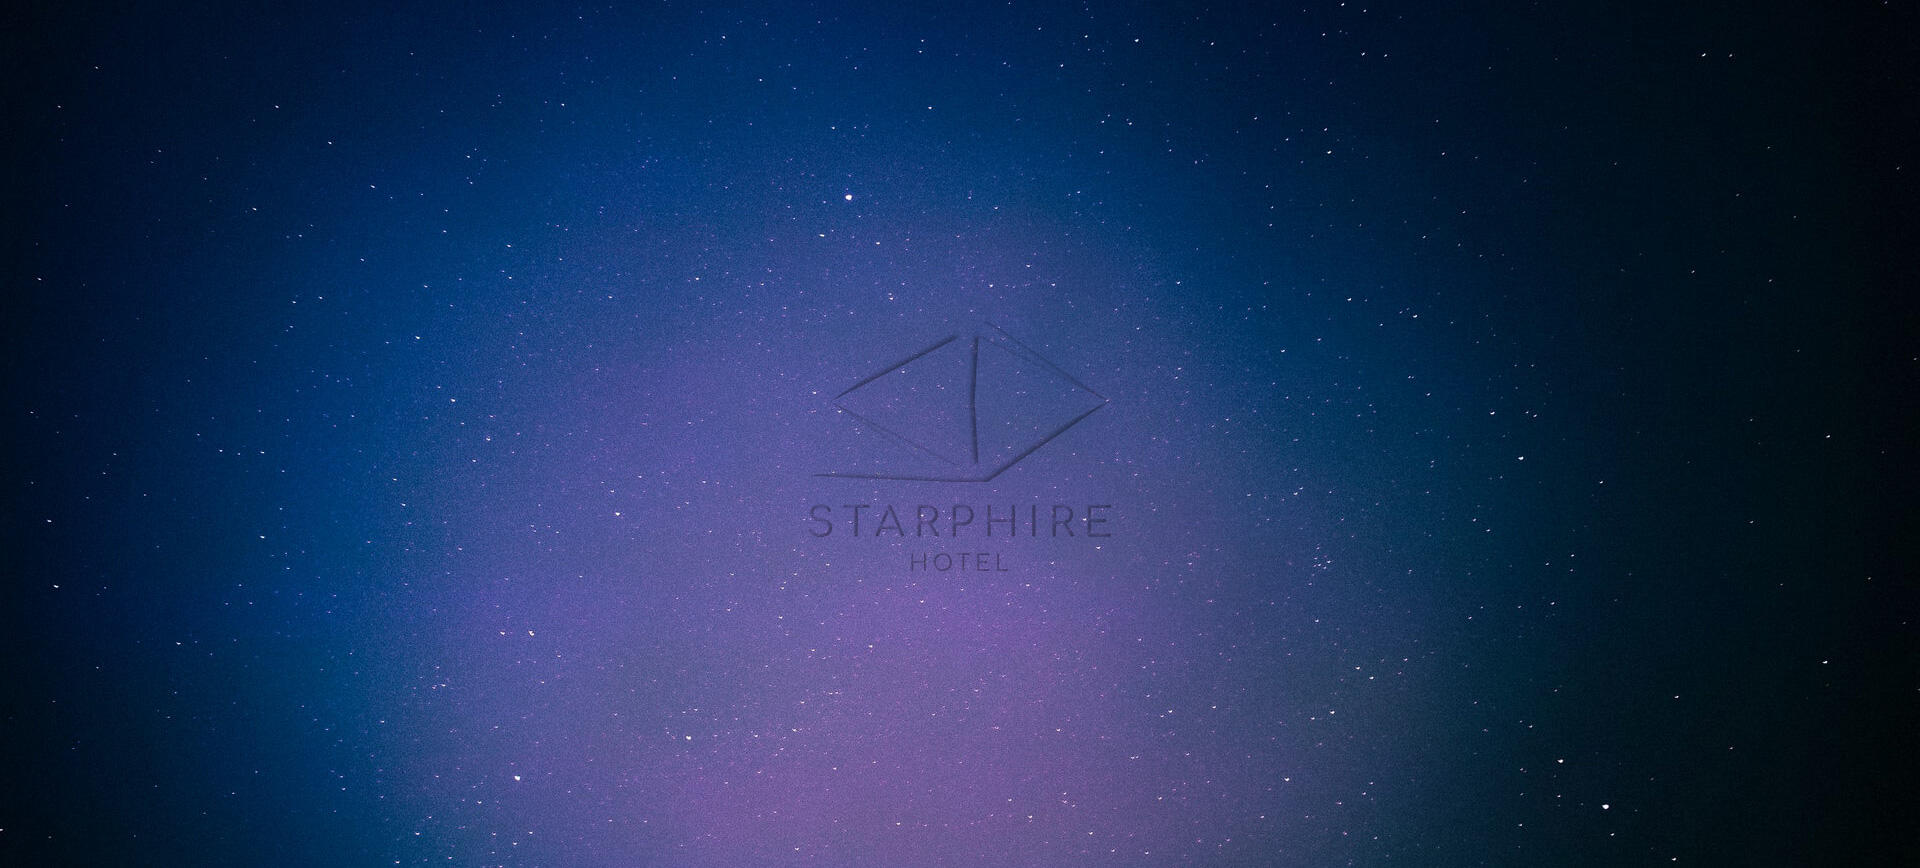 Starphire Hotel's logo